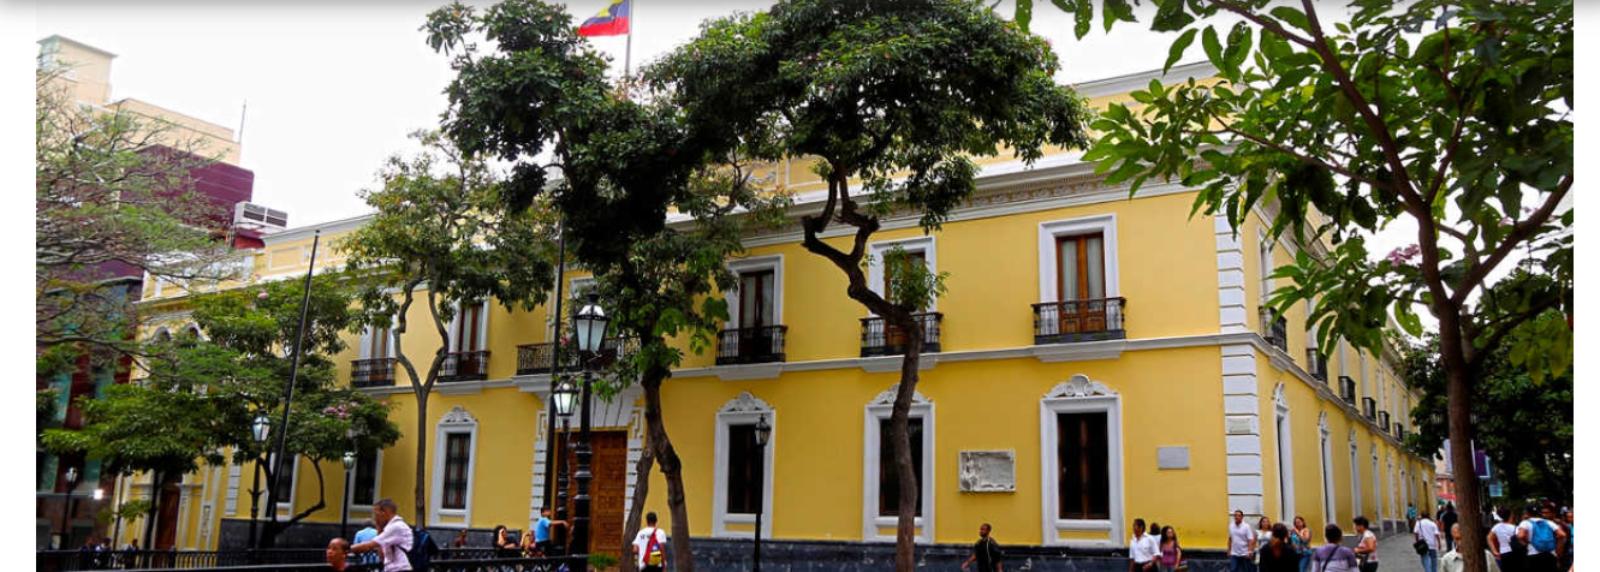 Casa Amarilla Caracas, Venezuela